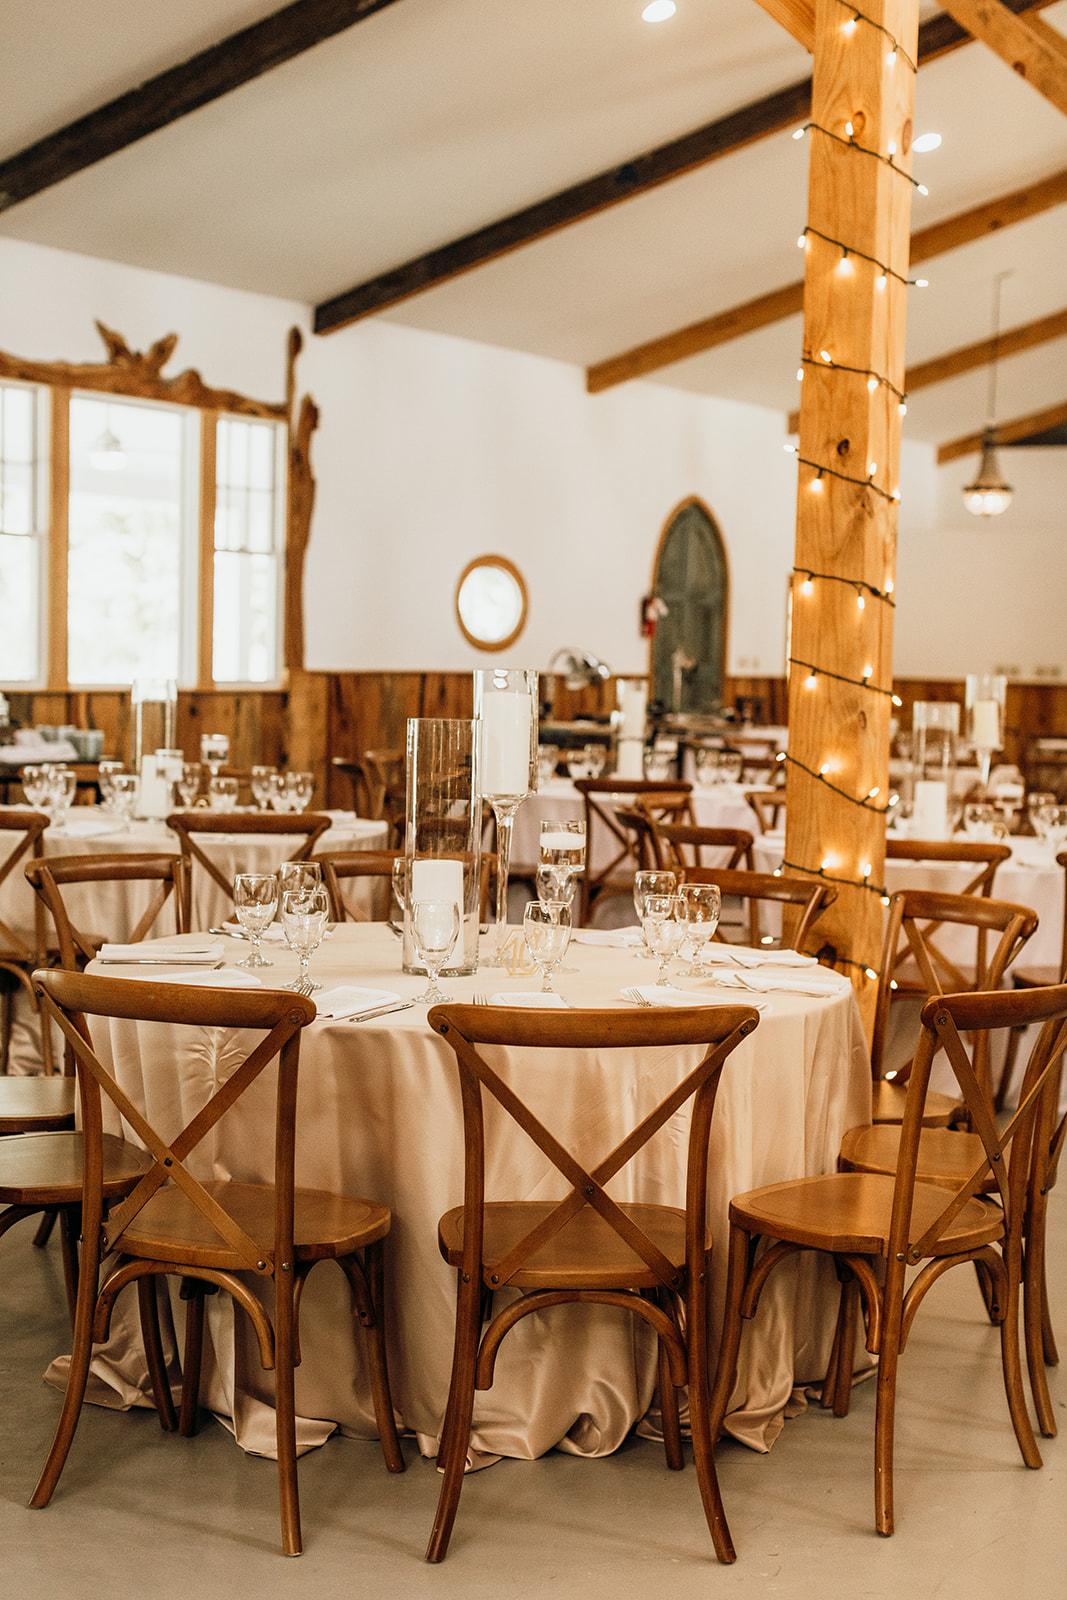 Casey-Josh-Pearl-In-The-Wild-Tallahassee-Wedding-111_websize.jpg